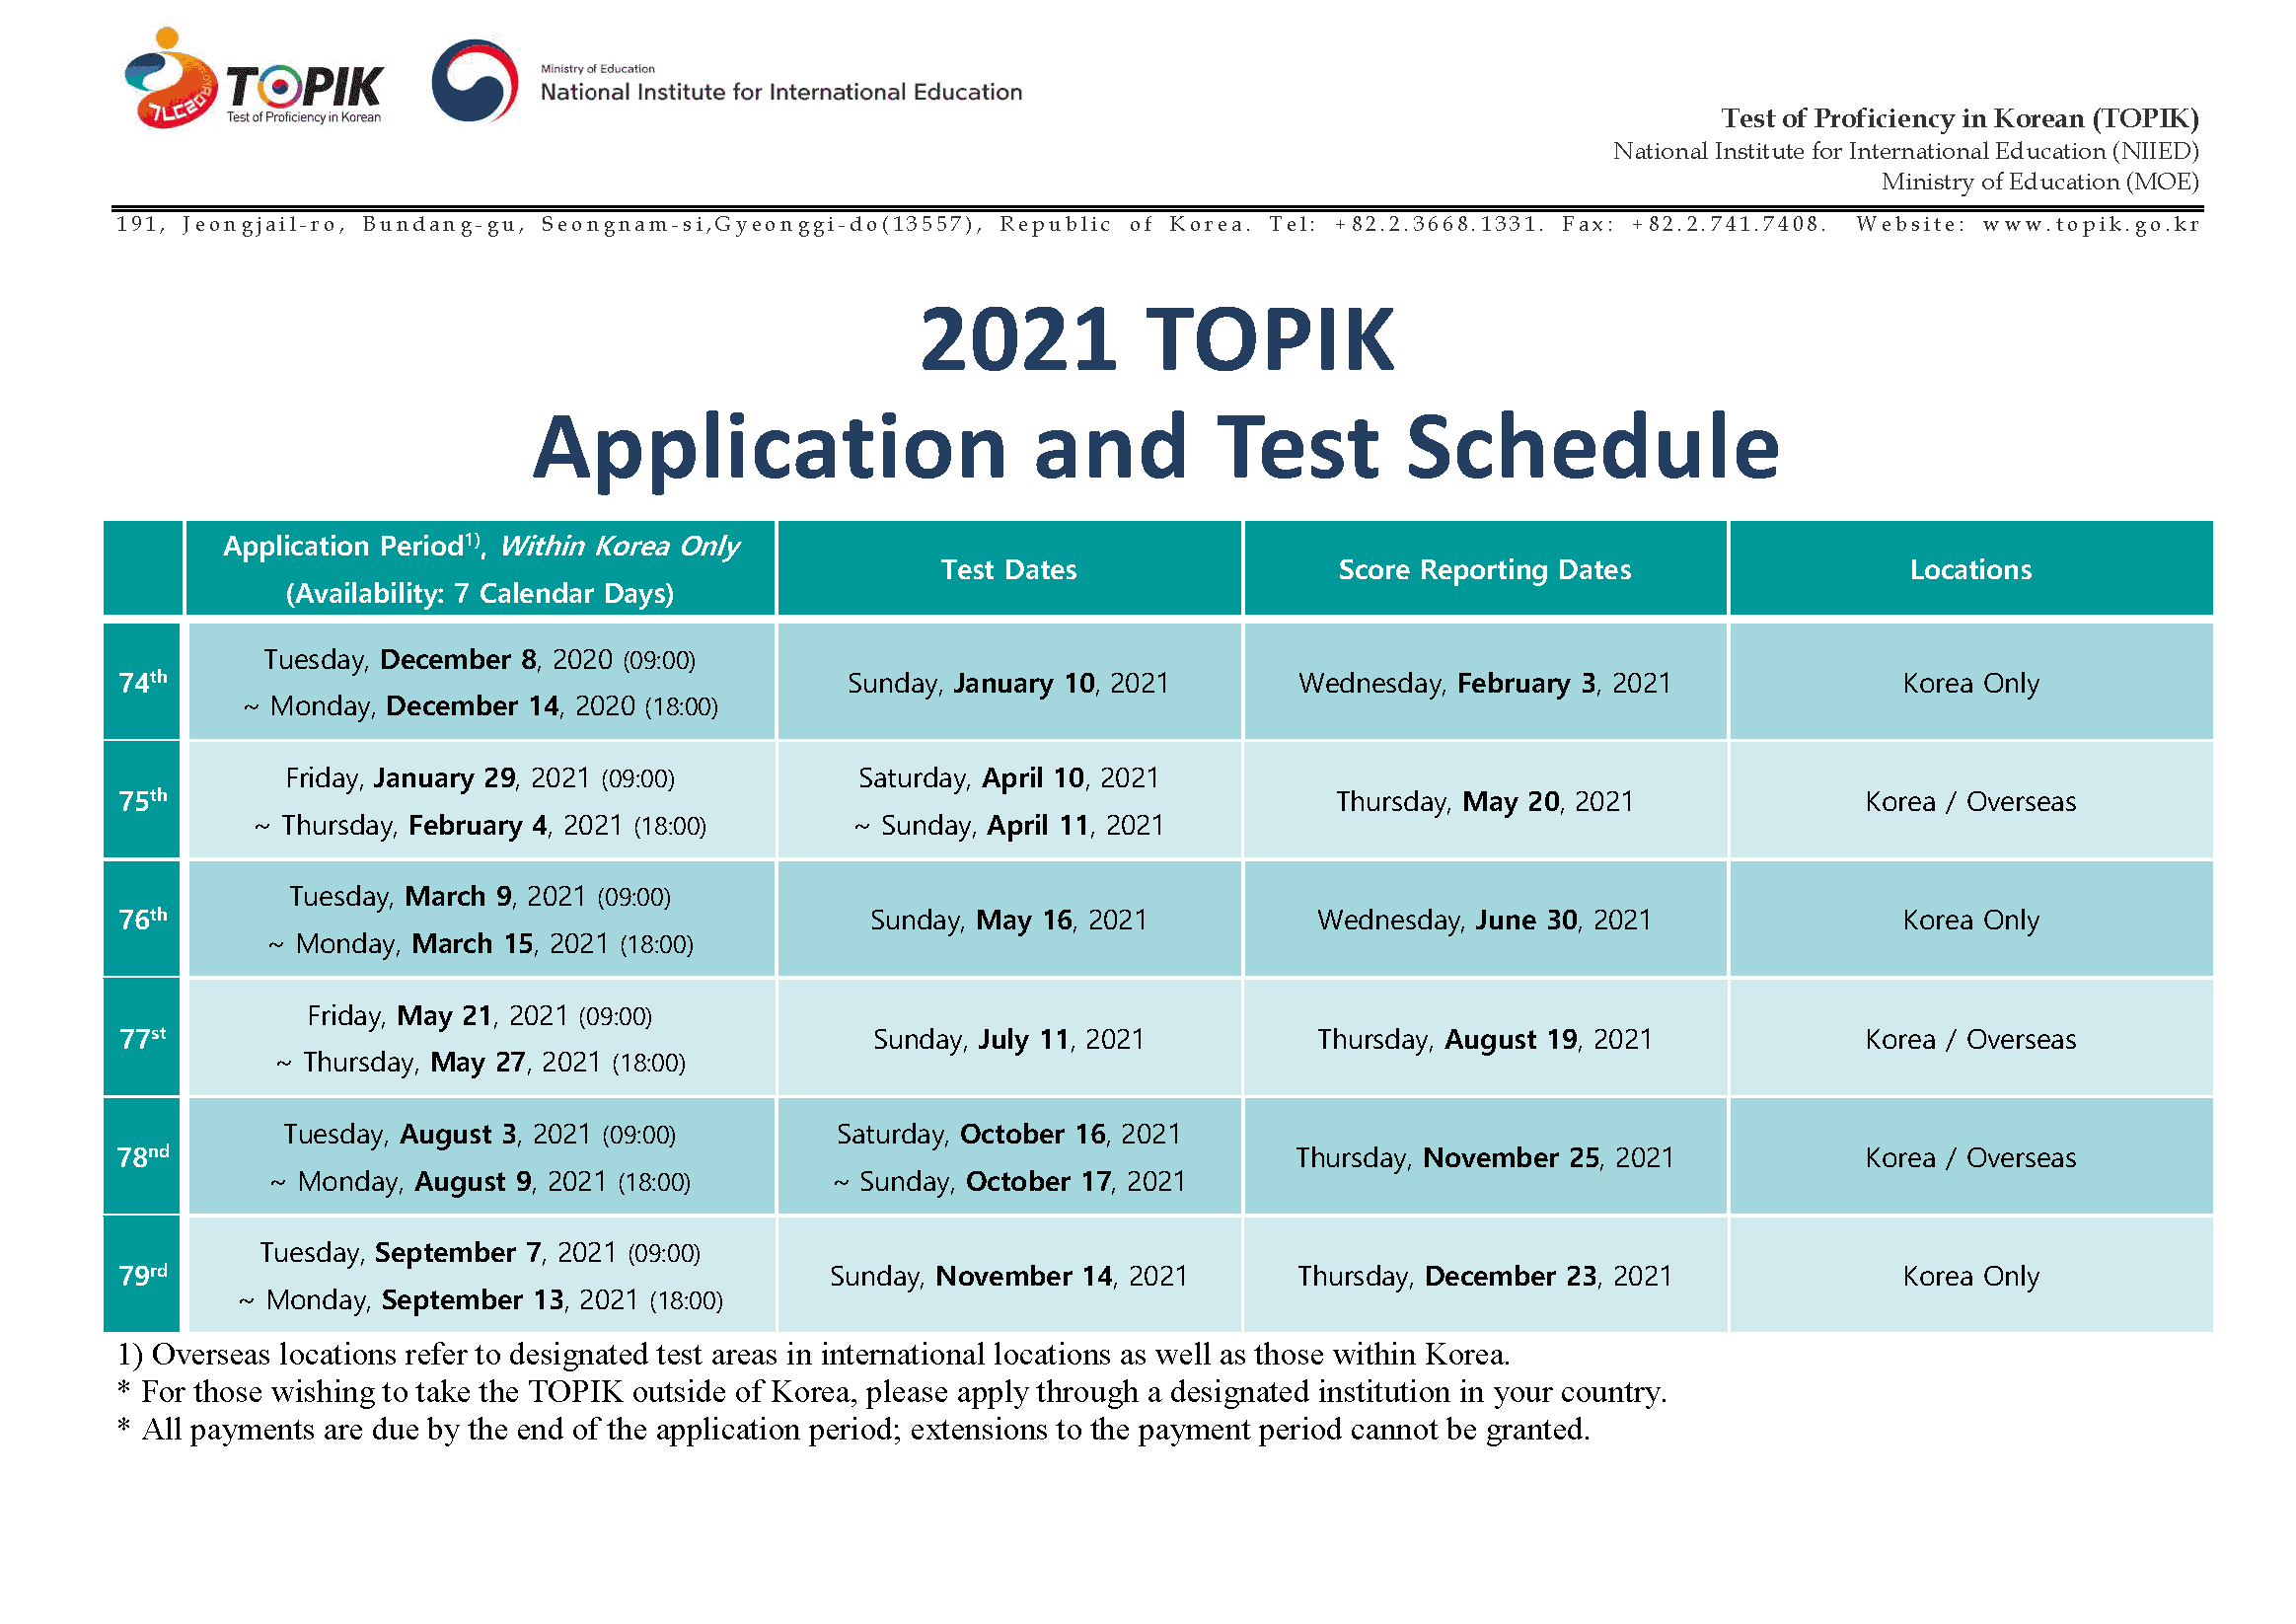 Year 2021 TOPIK Test Schedule in Korea and Overseas(English)